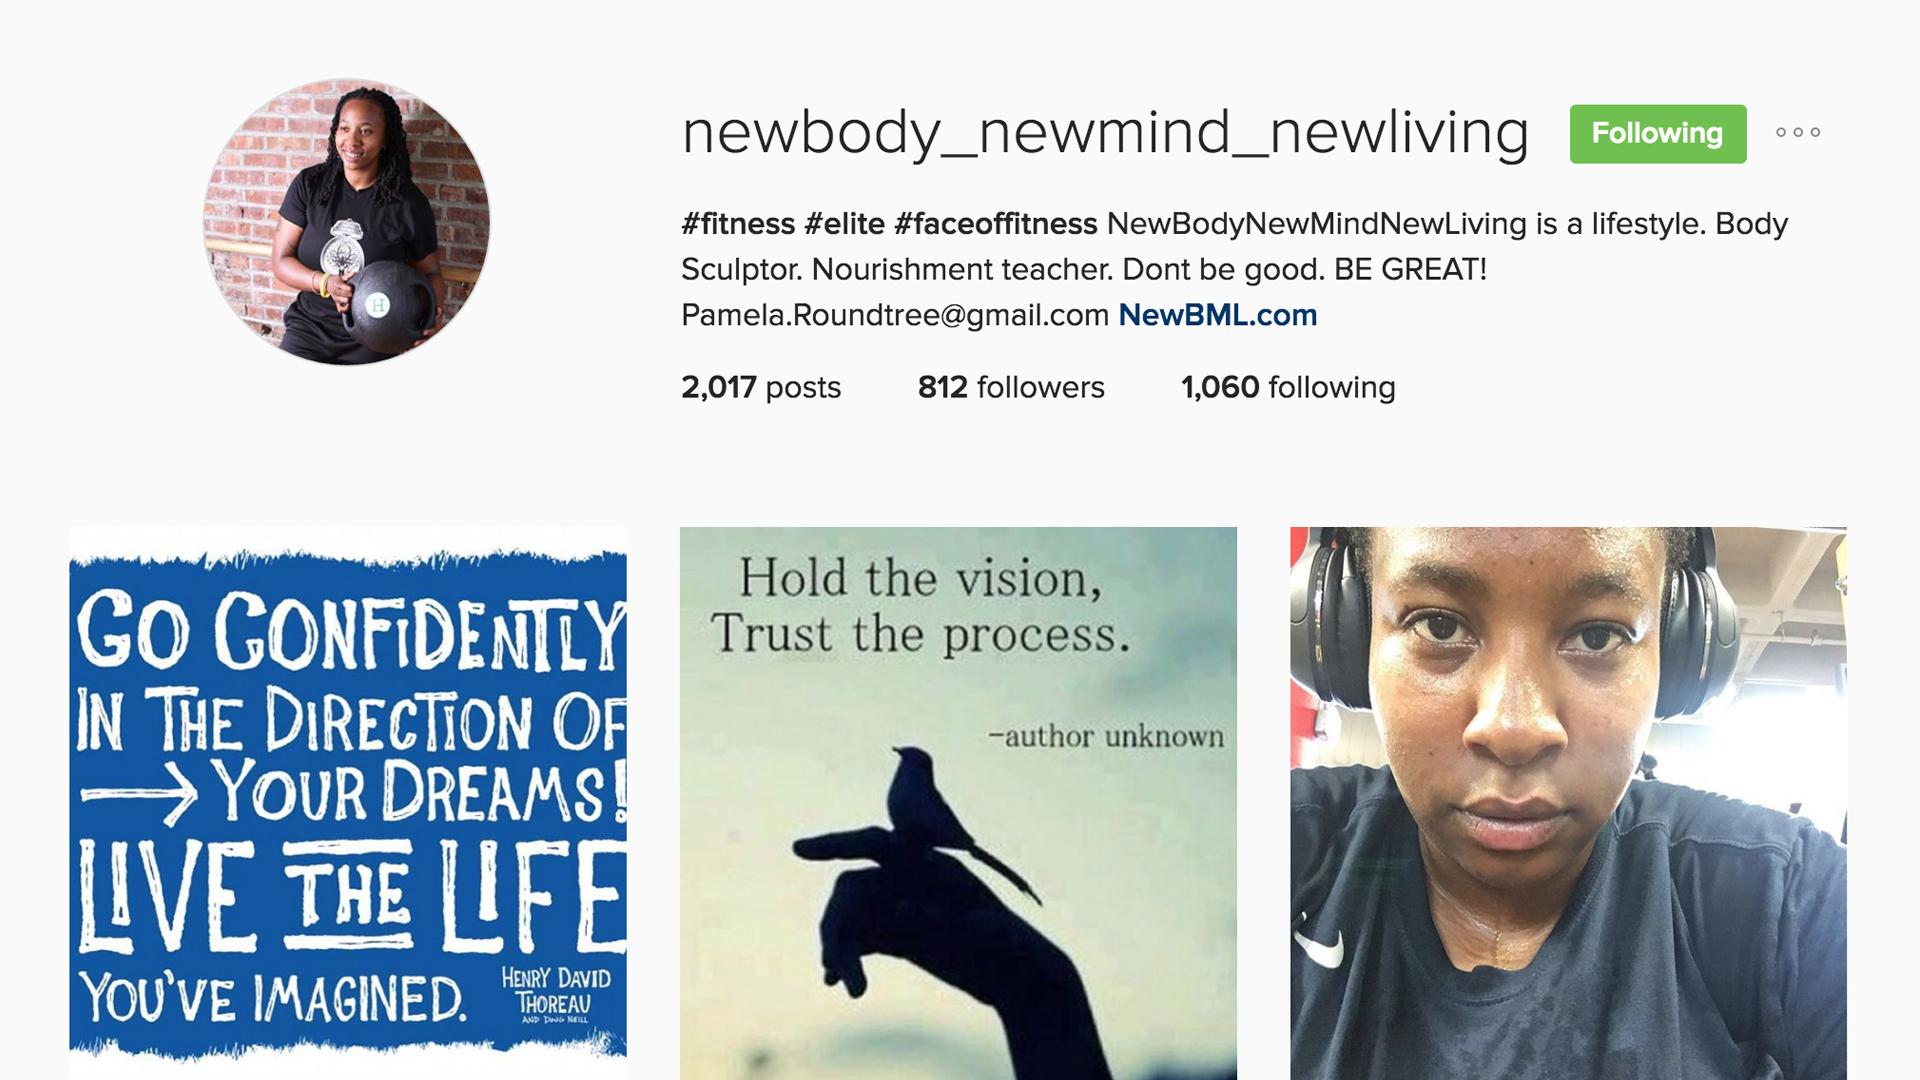 https://www.instagram.com/newbody_newmind_newliving/